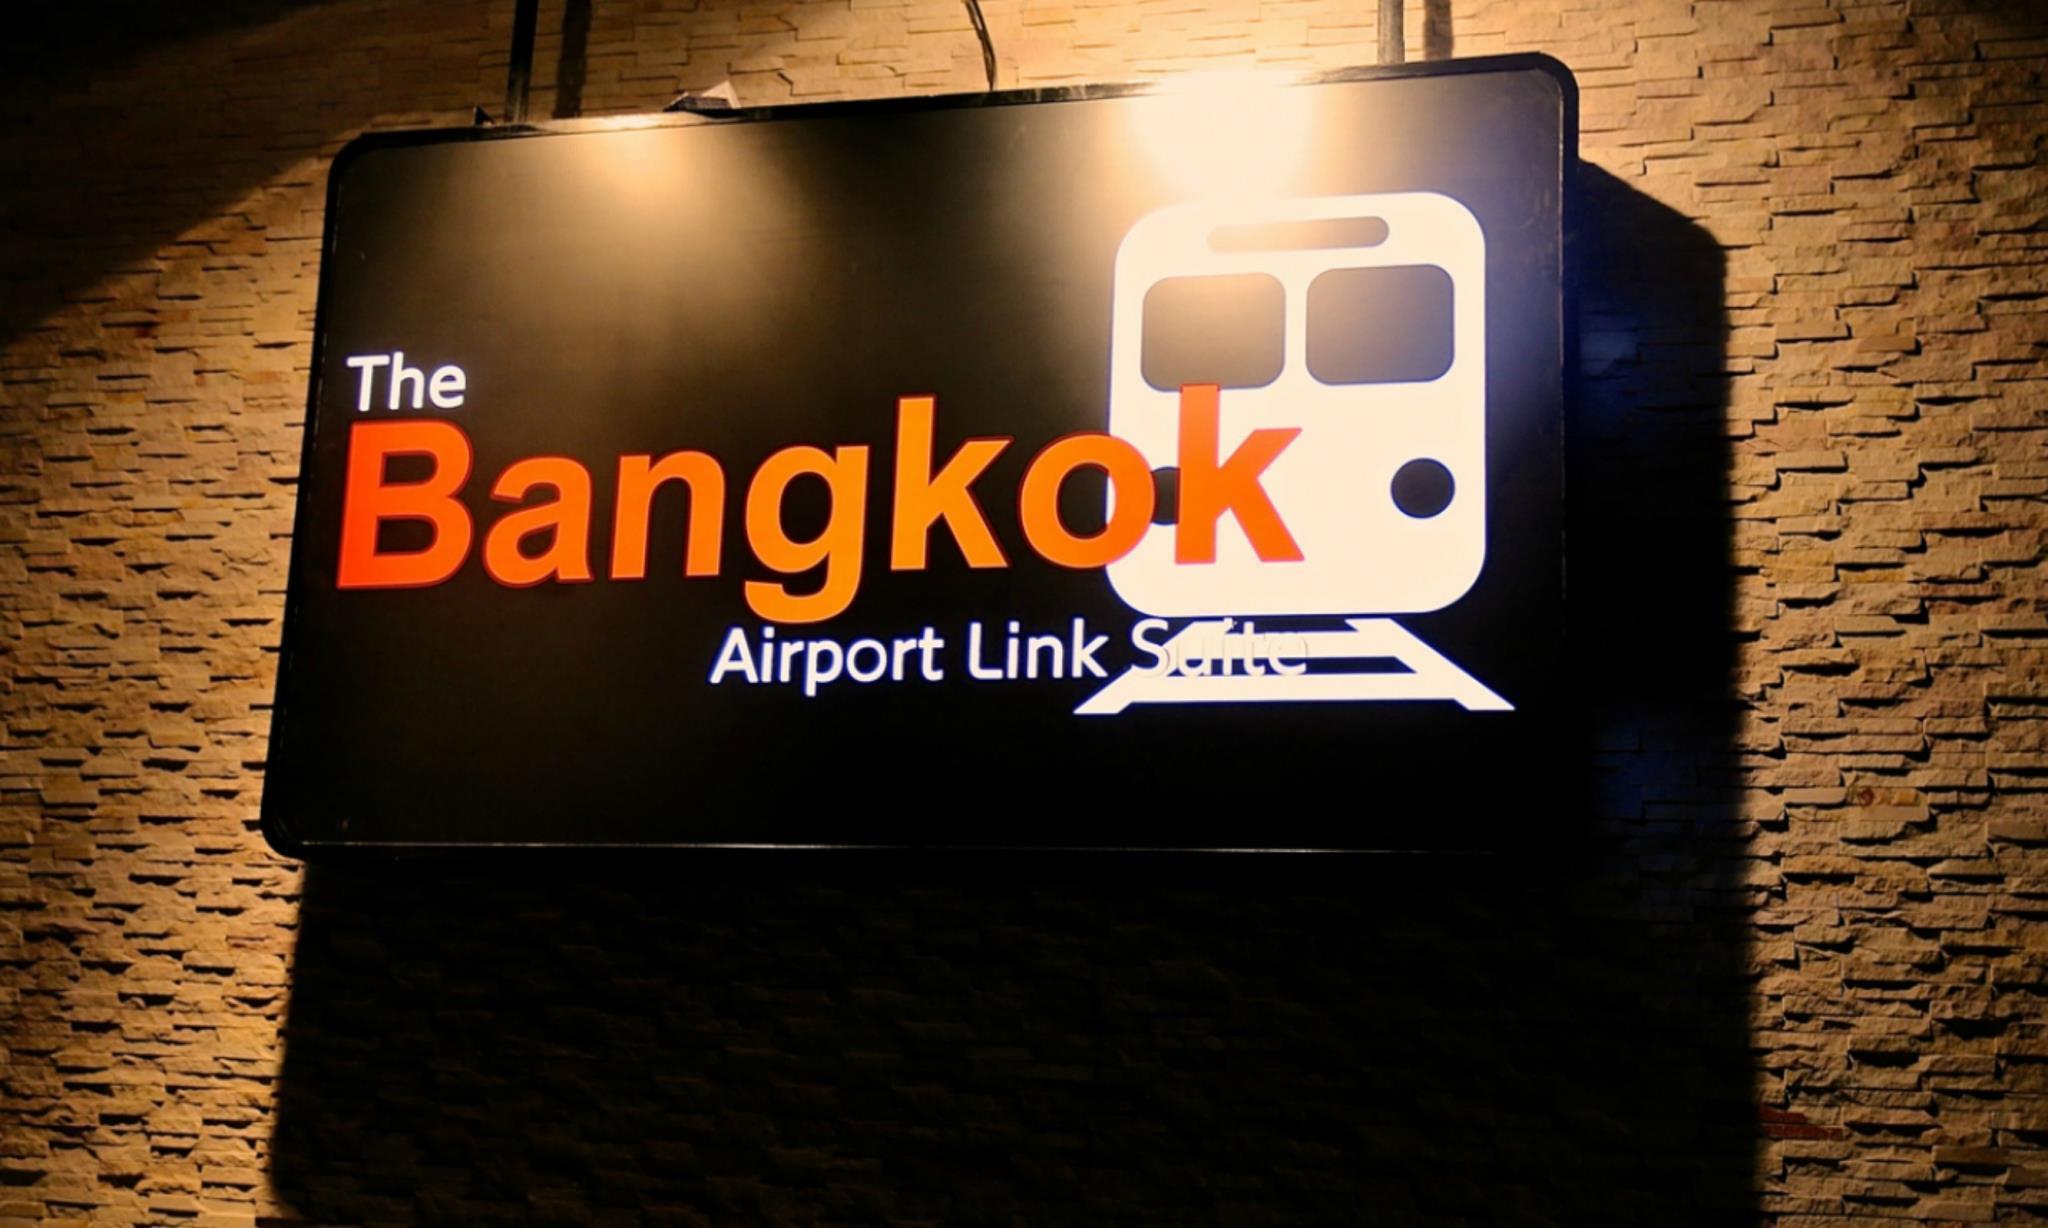 The Bangkok Airport Link Suite เดอะ แบงค็อก แอร์พอร์ต ลิงค์ สวีท